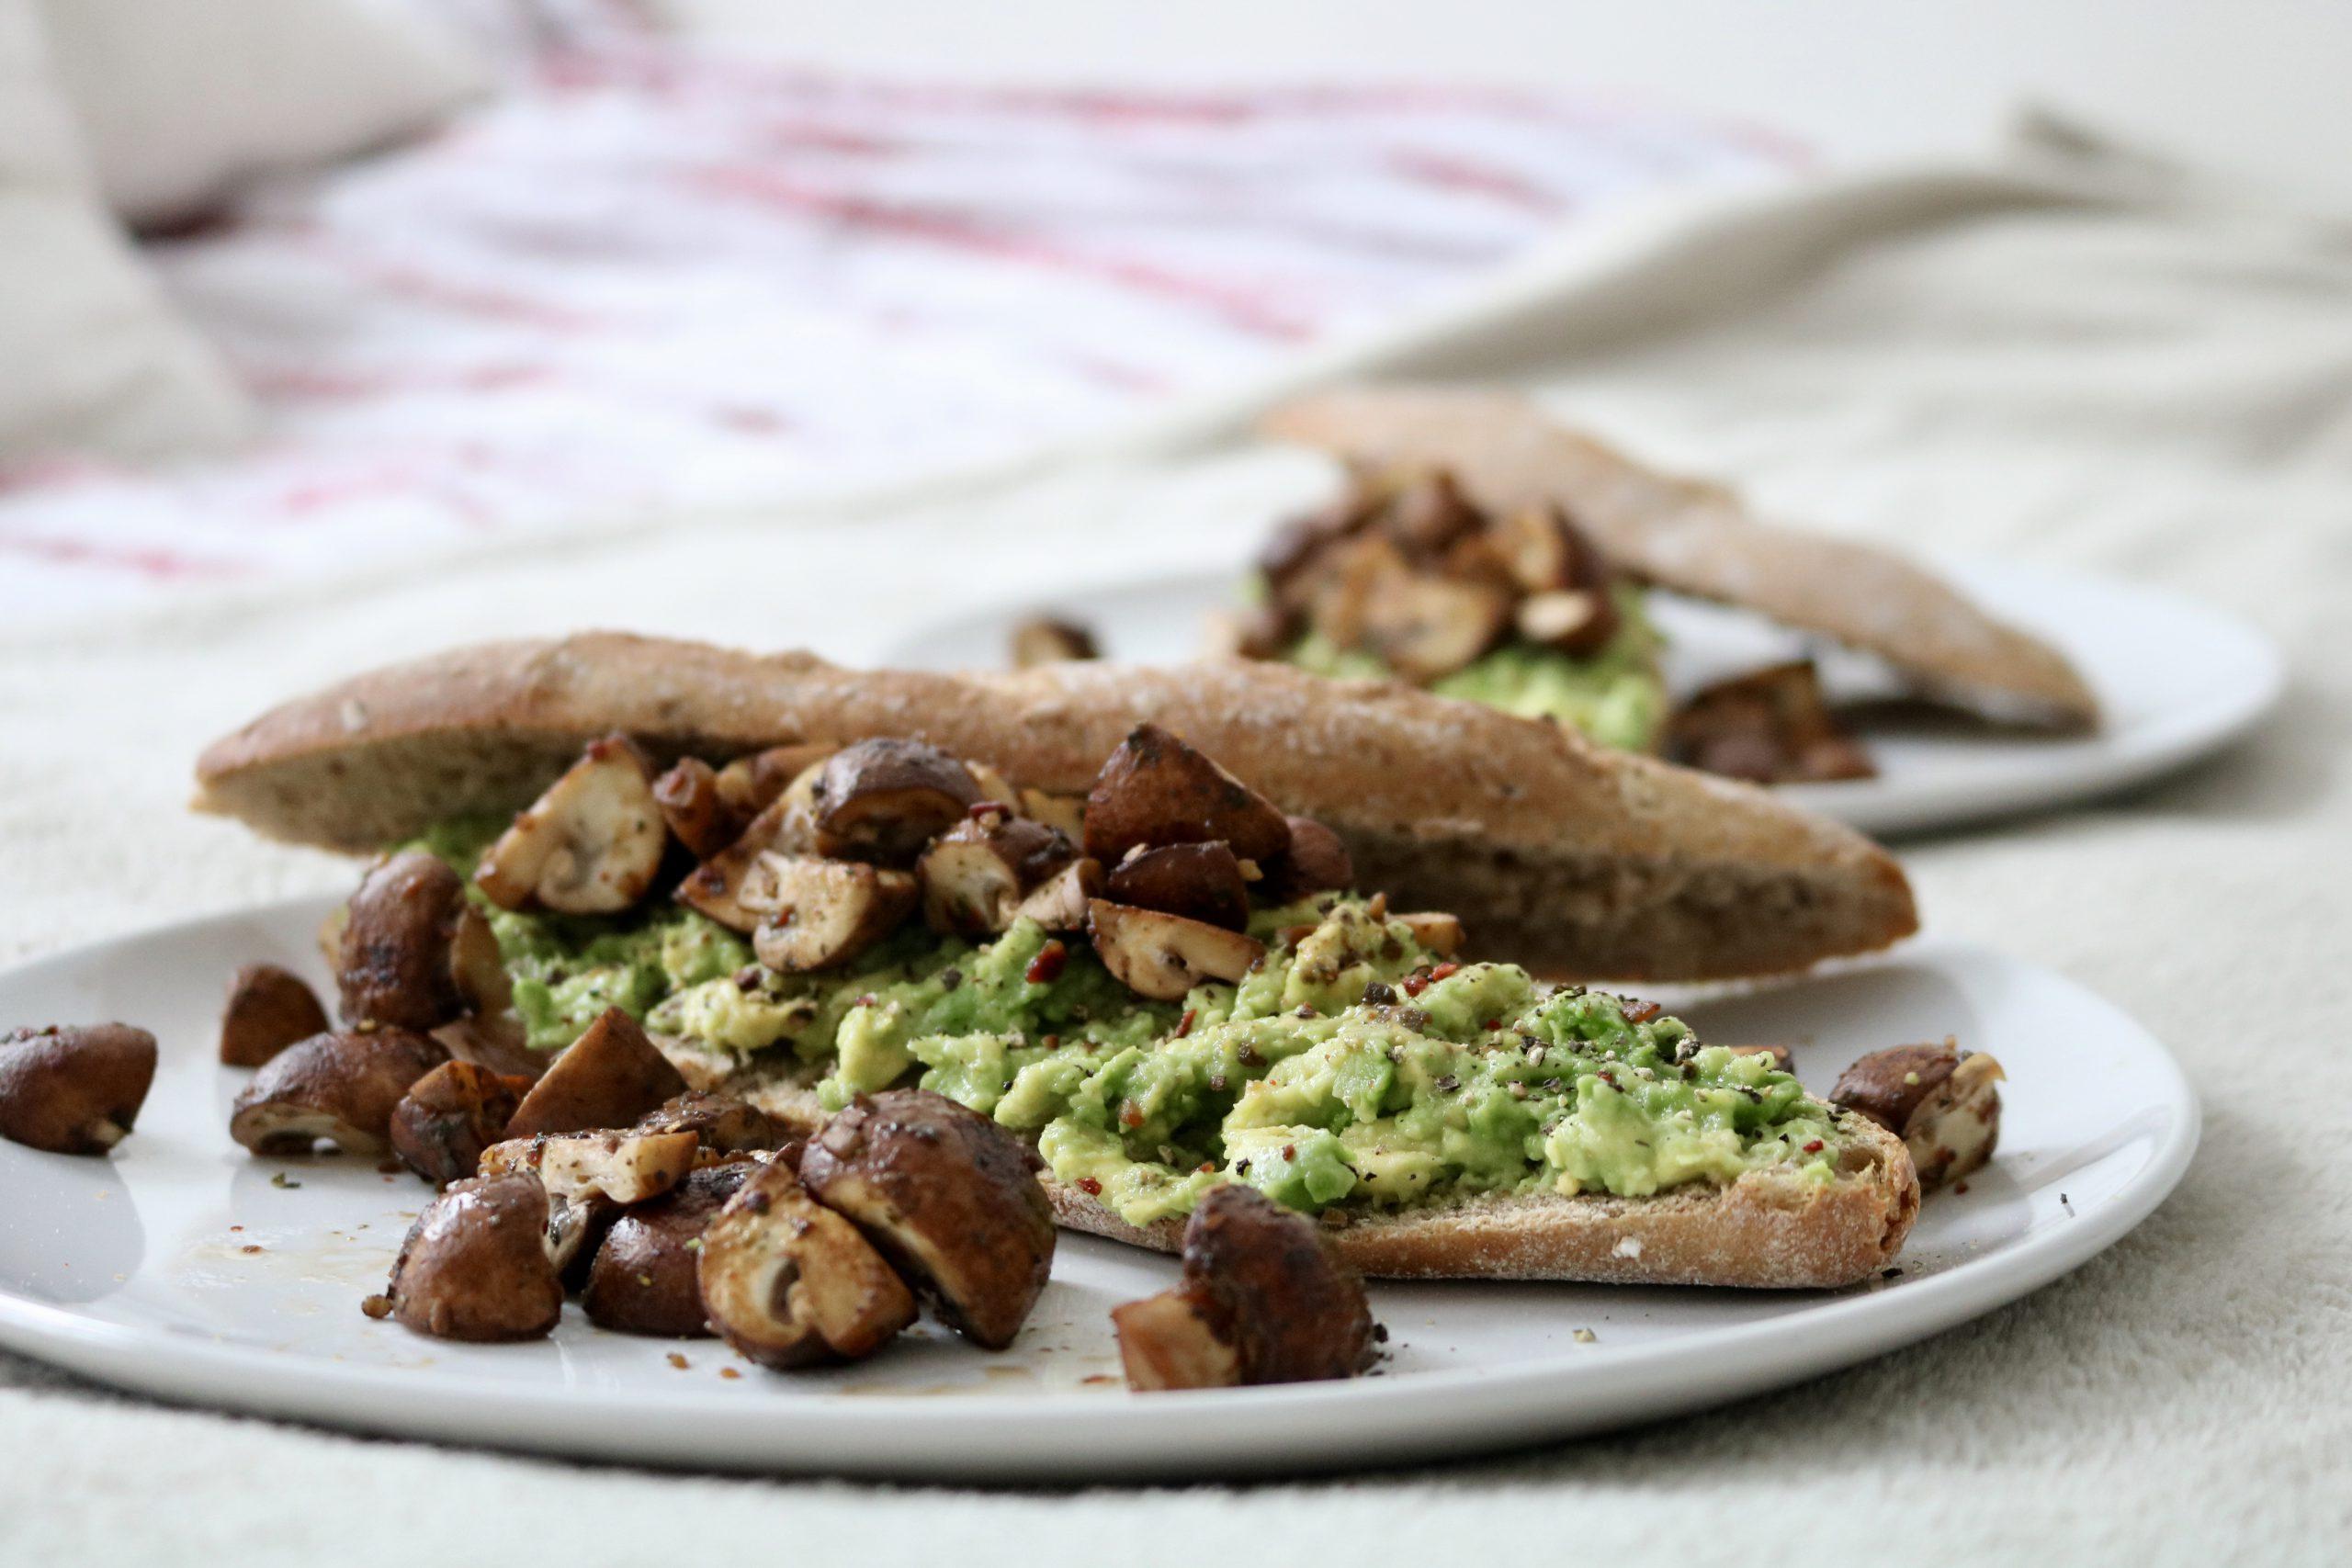 Avocado Sandwich with Mushrooms